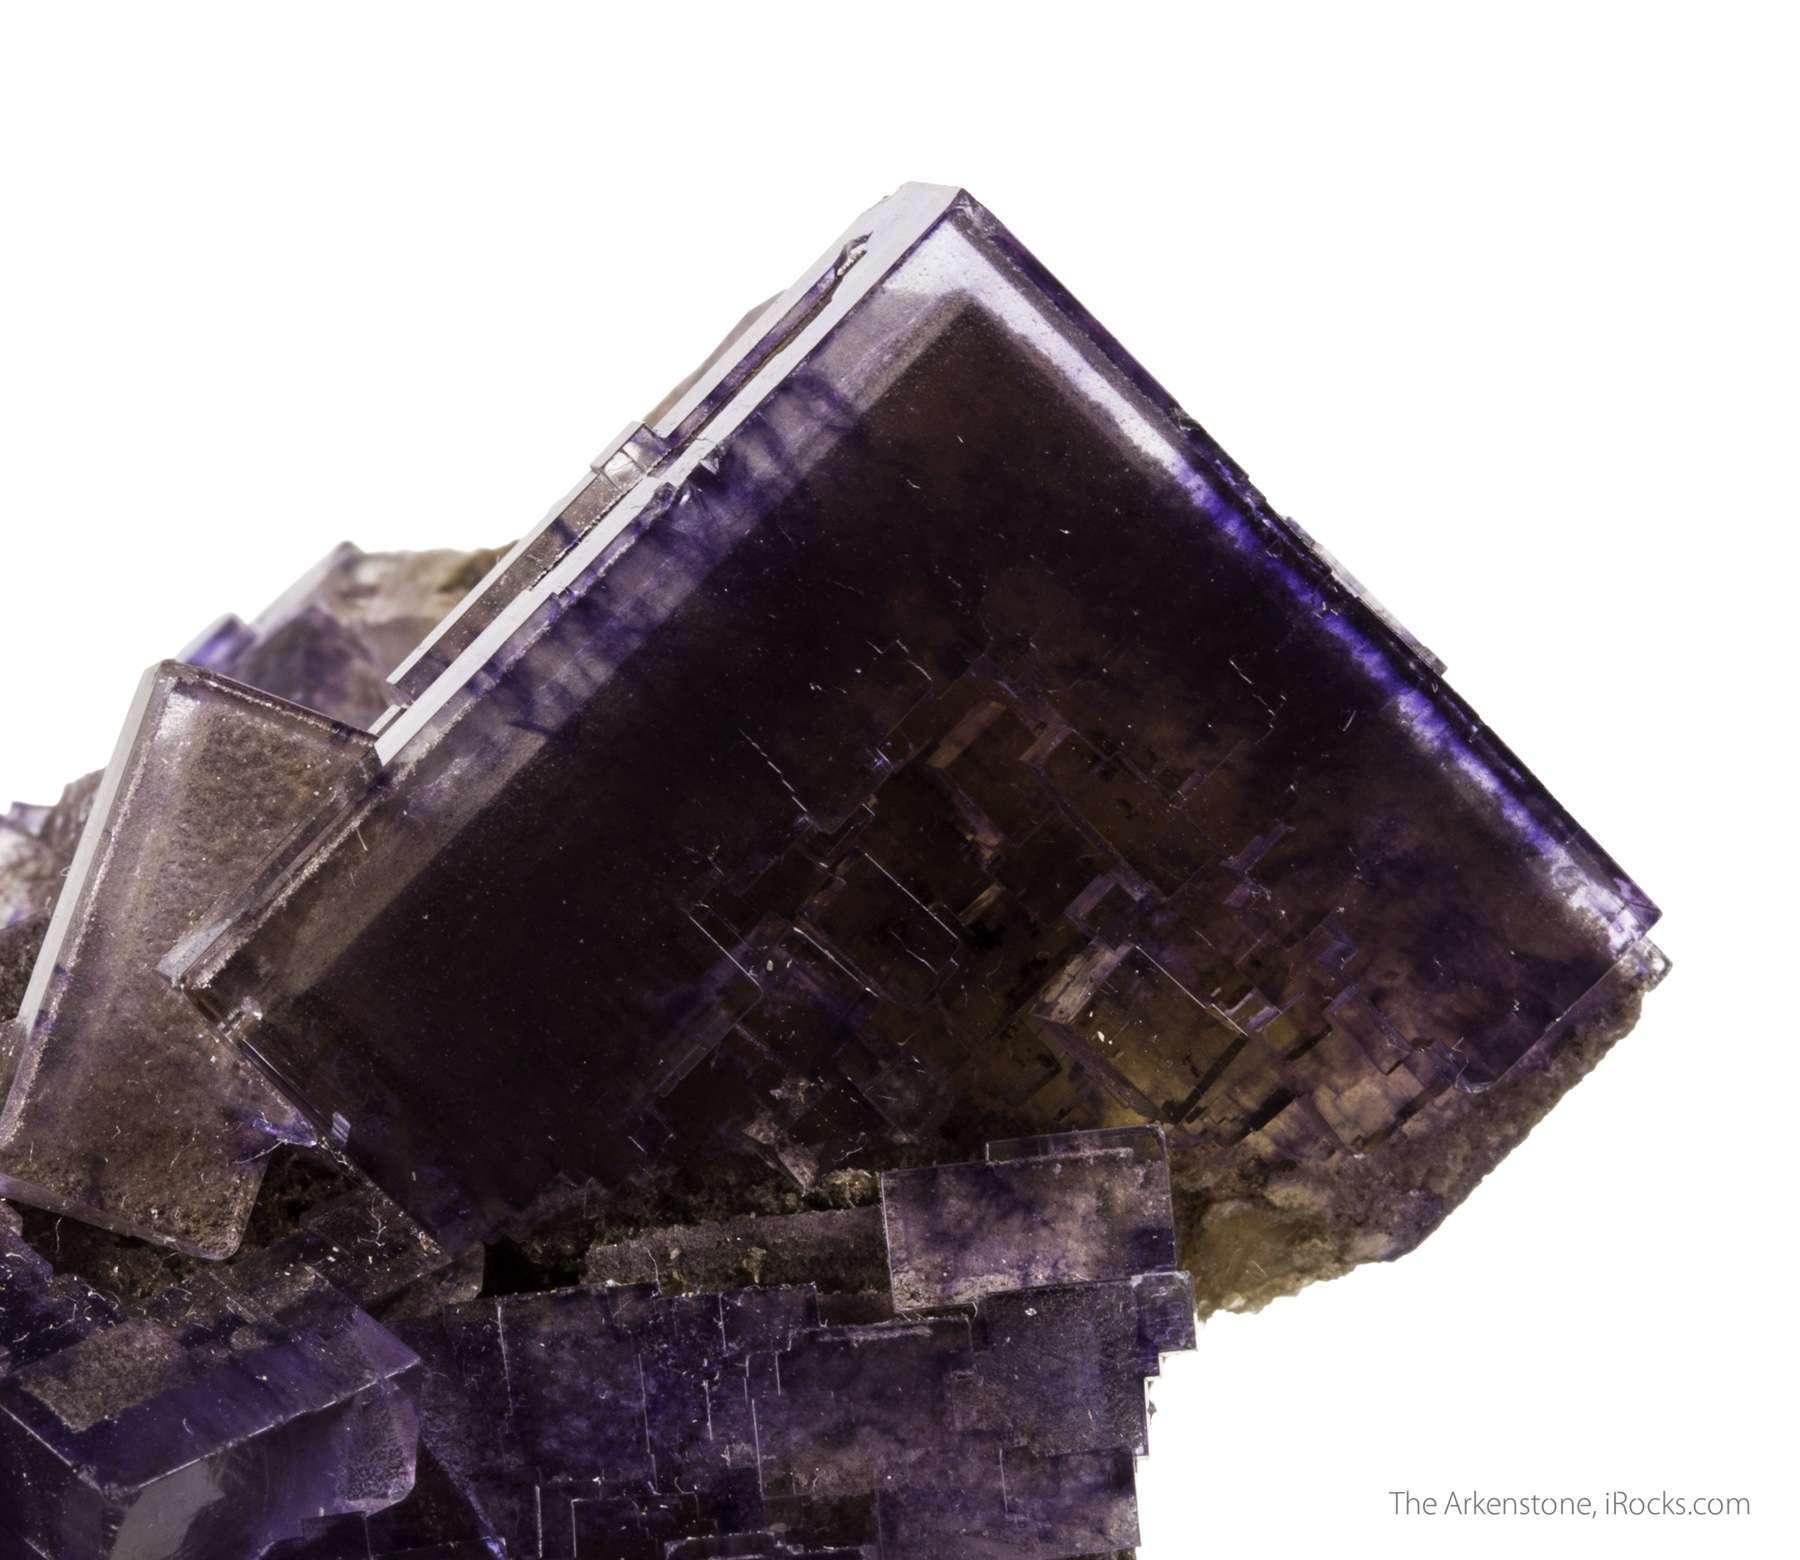 The fluorite crystals cluster exhibit opaque dark purple initiation